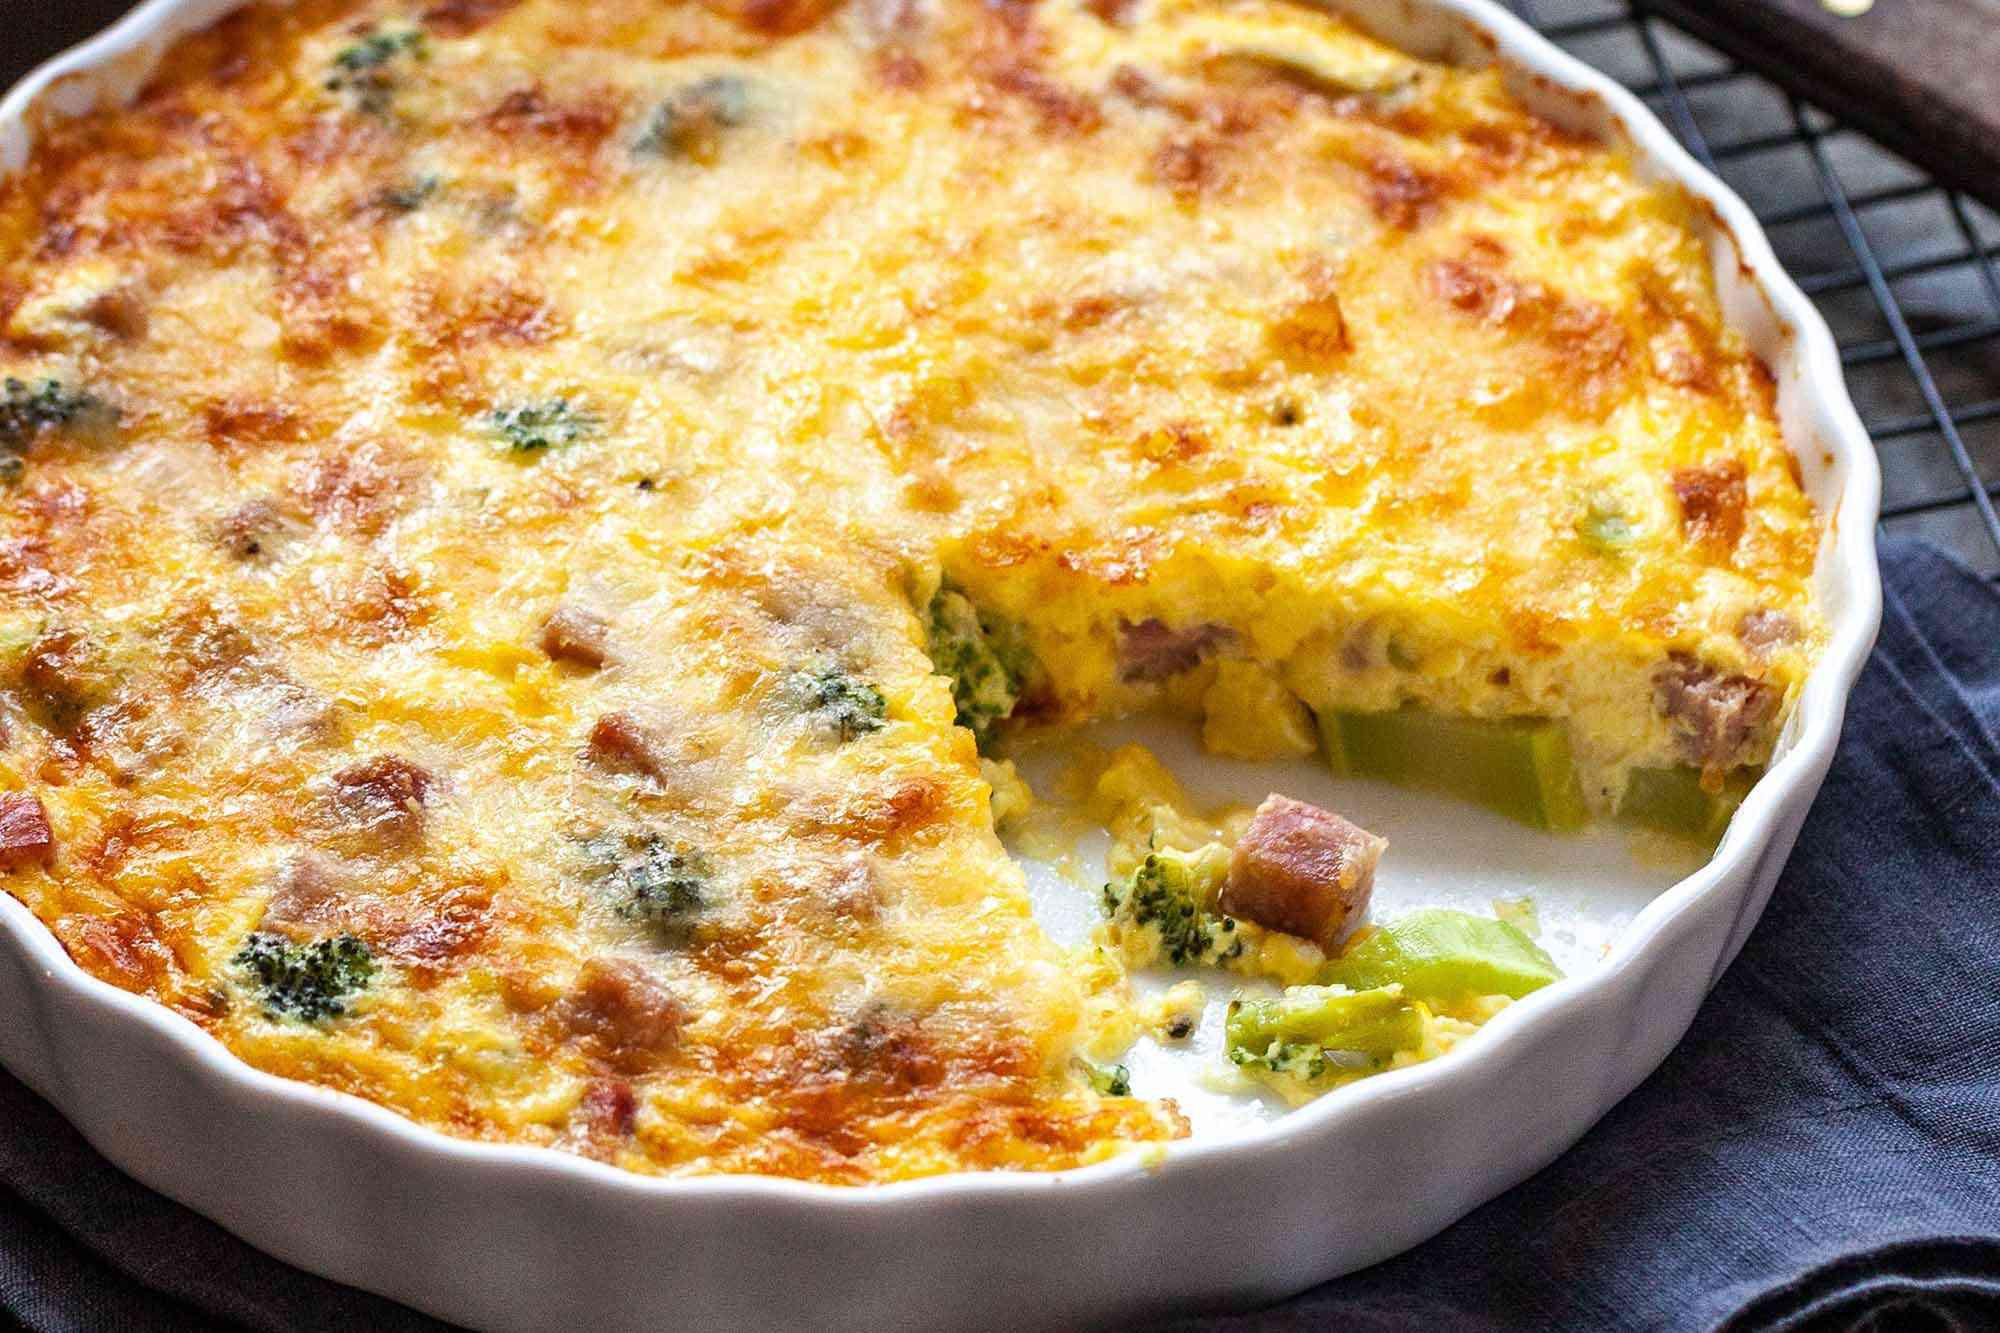 Crustless Quiche with Ham - close up of ham and broccoli quiche in a white dish